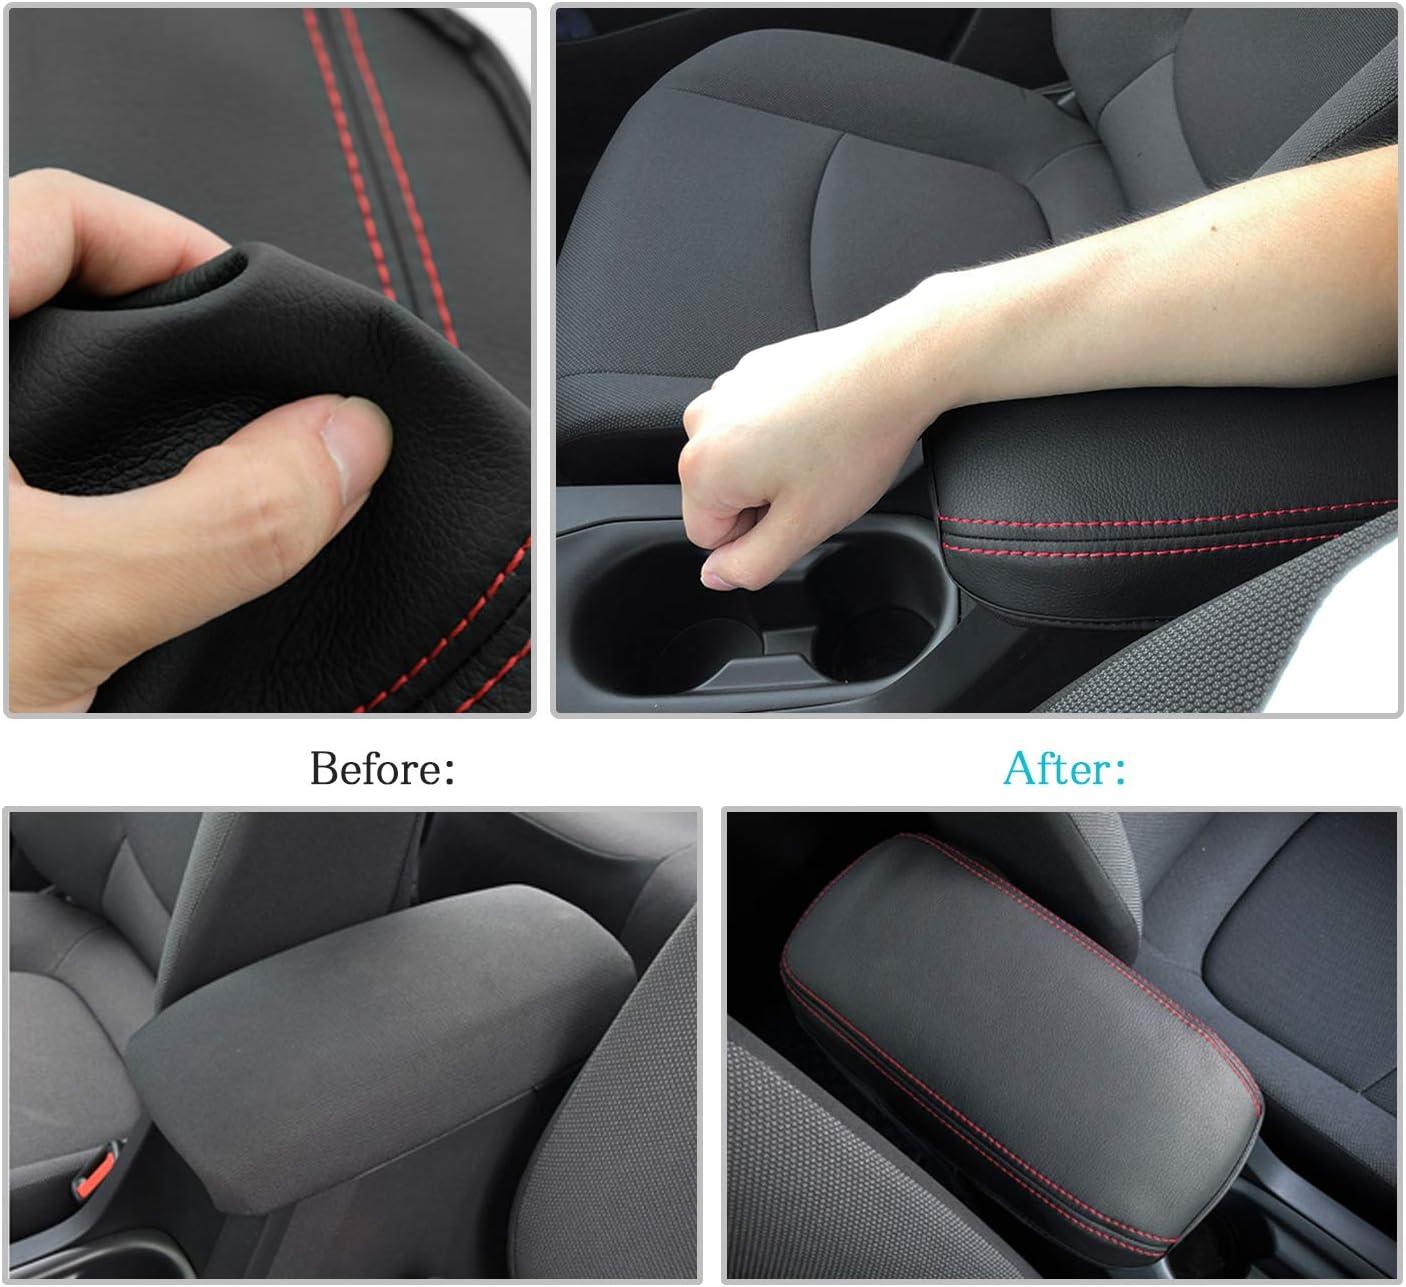 CDEFG Car Center Console Pad for 2020 Corolla E210 Auto Armrest Seat Box Cover Protector Black Leather